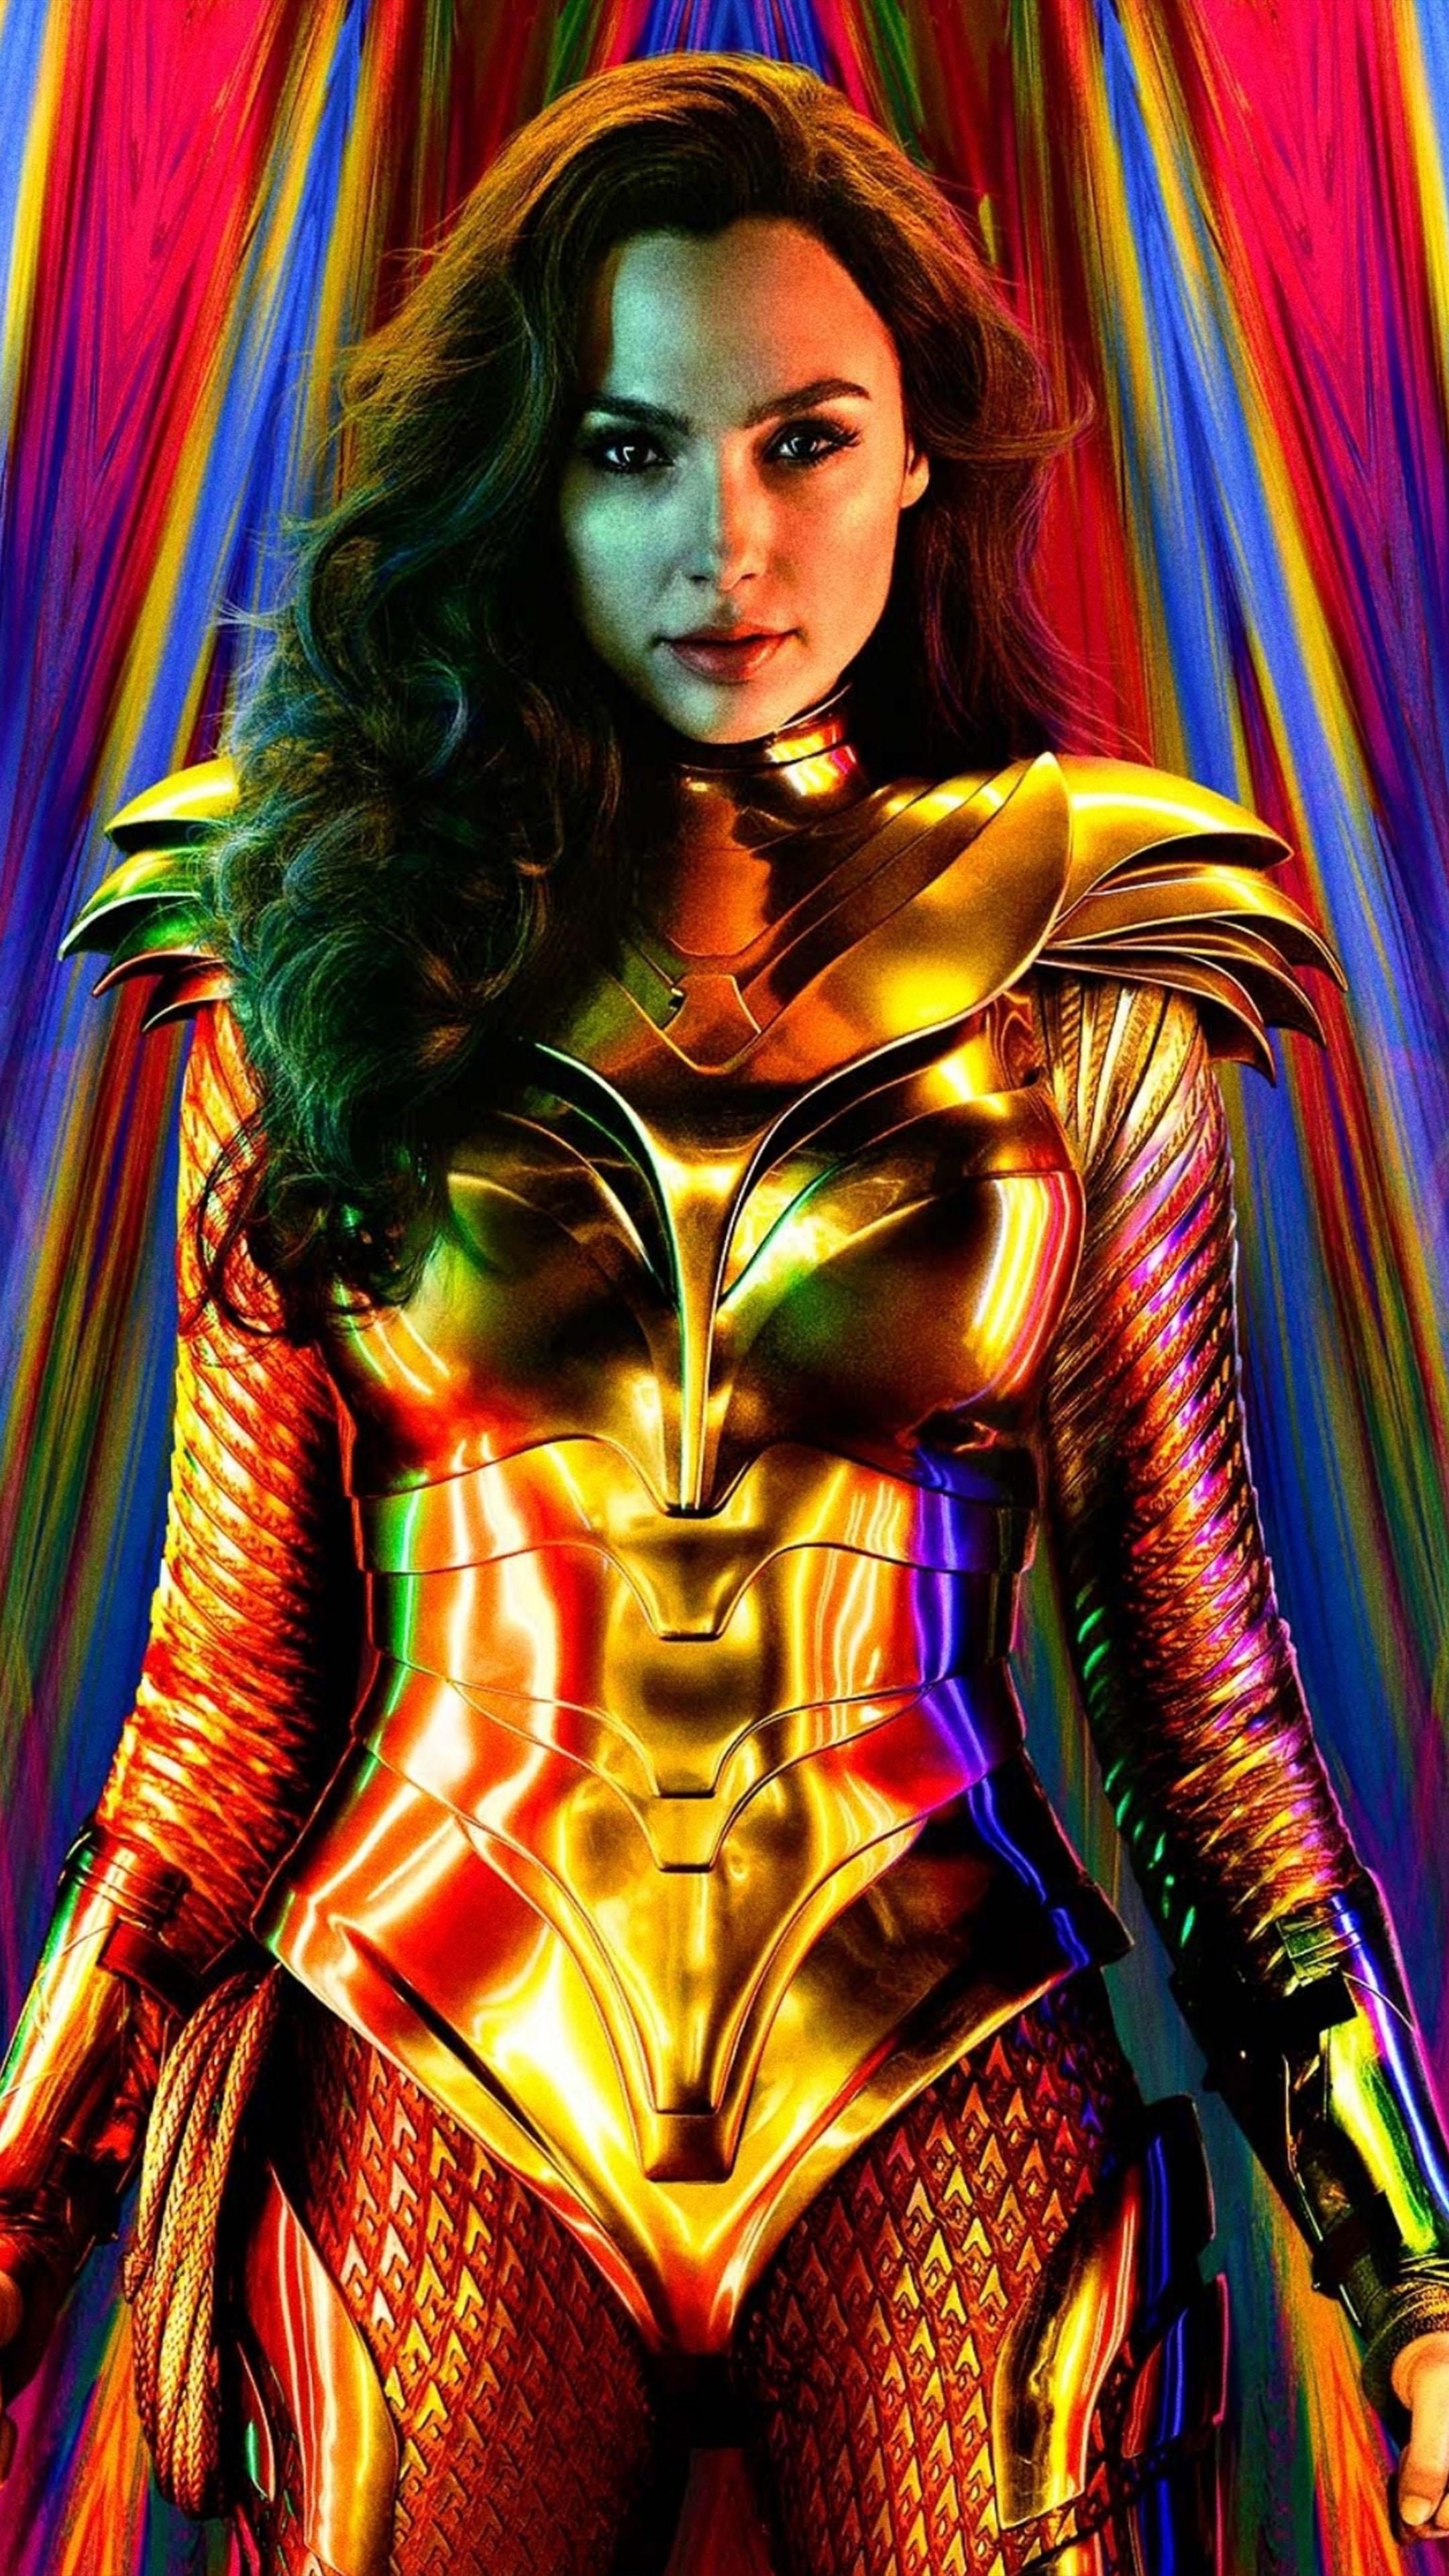 Gal Gadot In Wonder Woman 1984 Free 4K Ultra HD Mobile Wallpaper